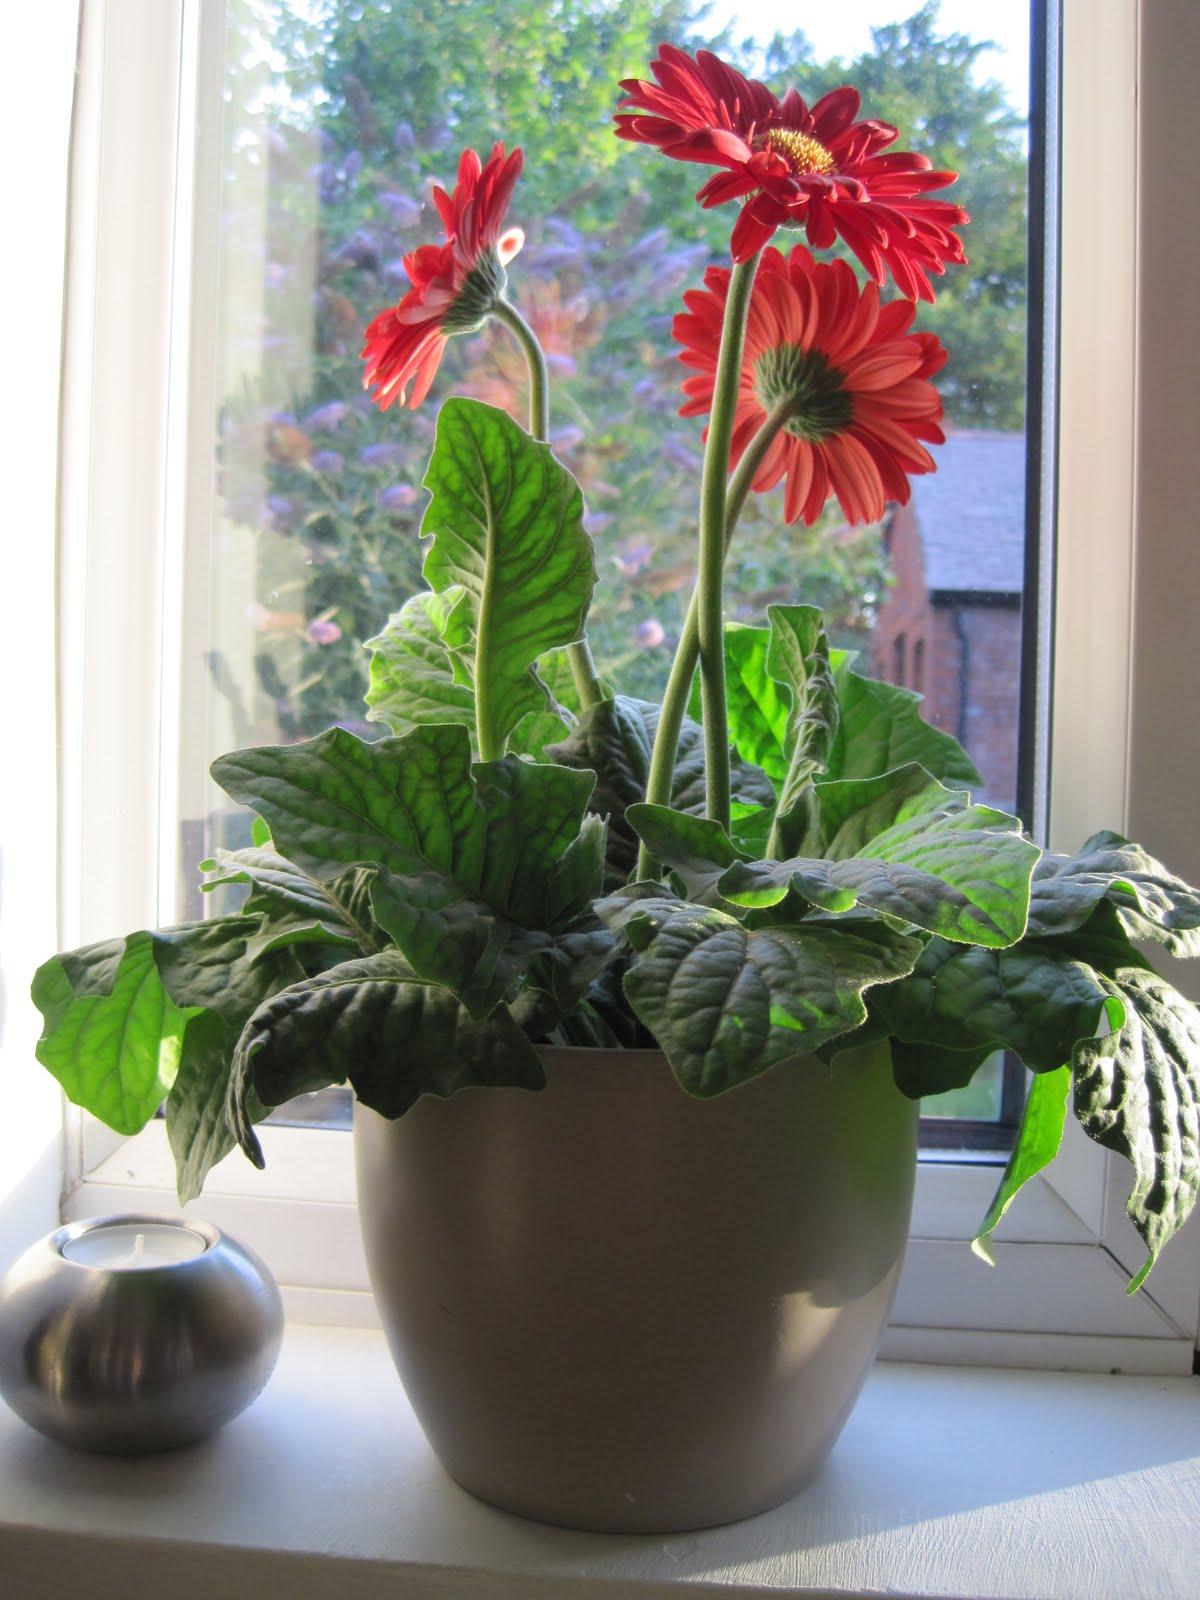 Комнатная гербера, уход за цветком в домашних условиях